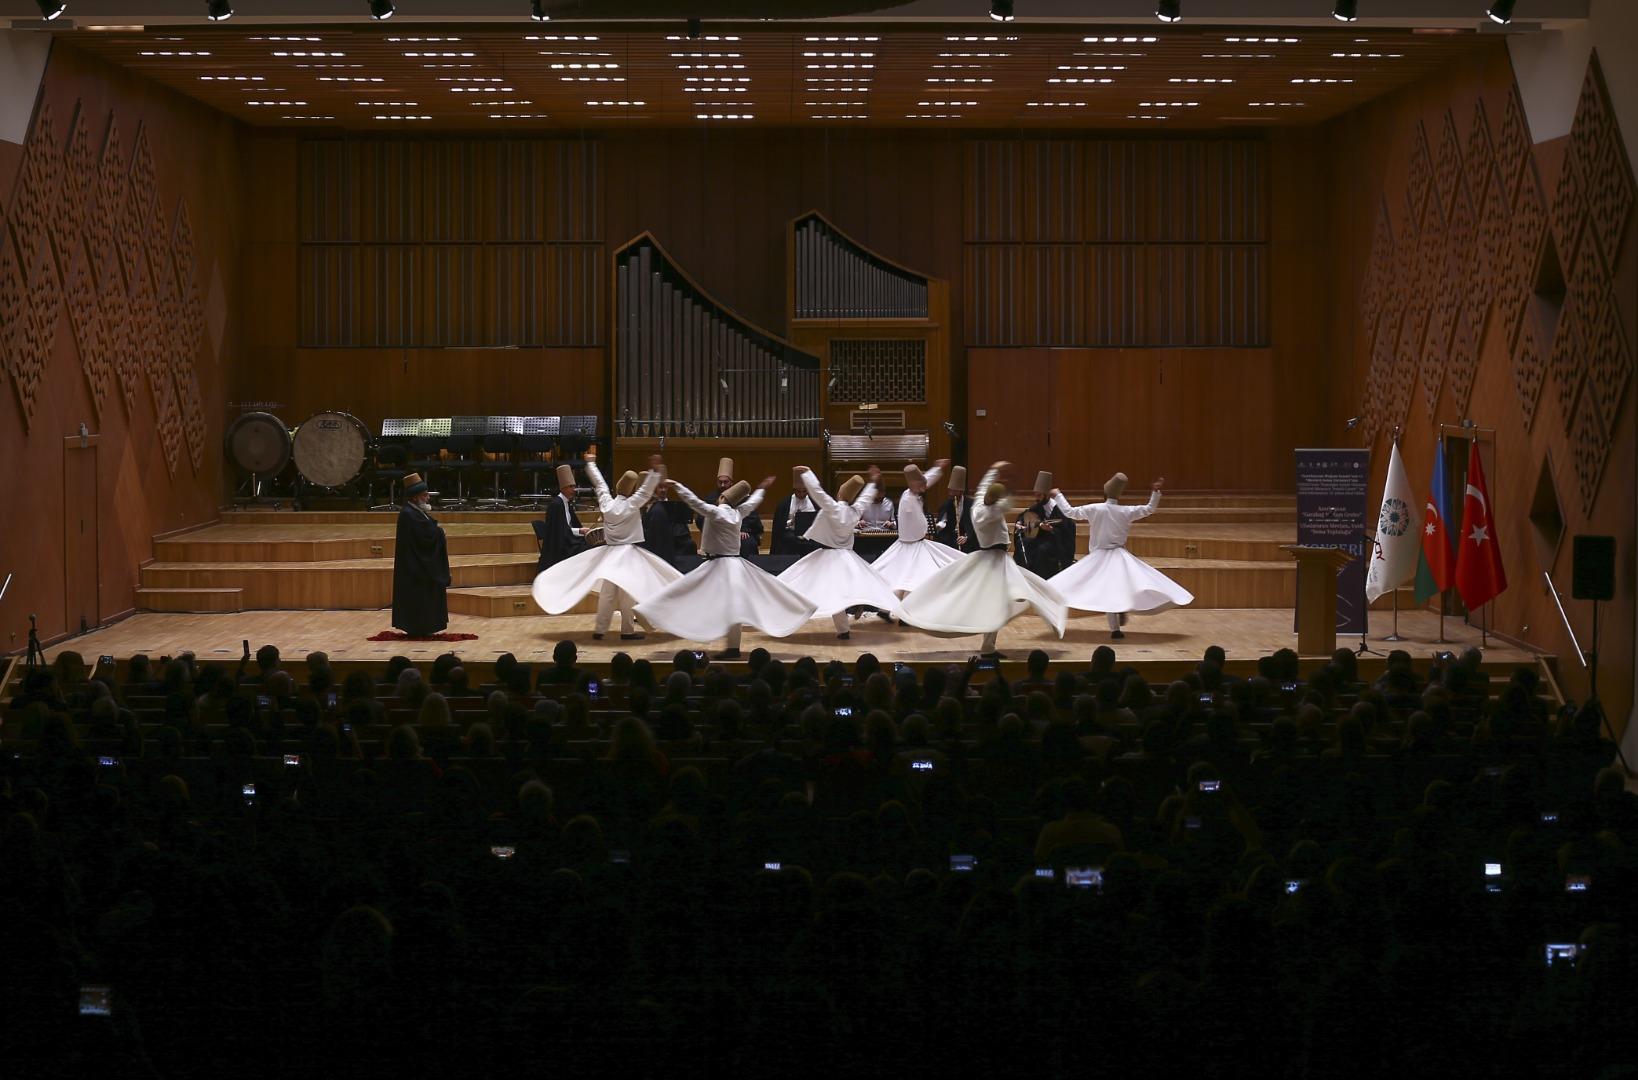 Ankara'da sema gösterisi ve muğam konseri